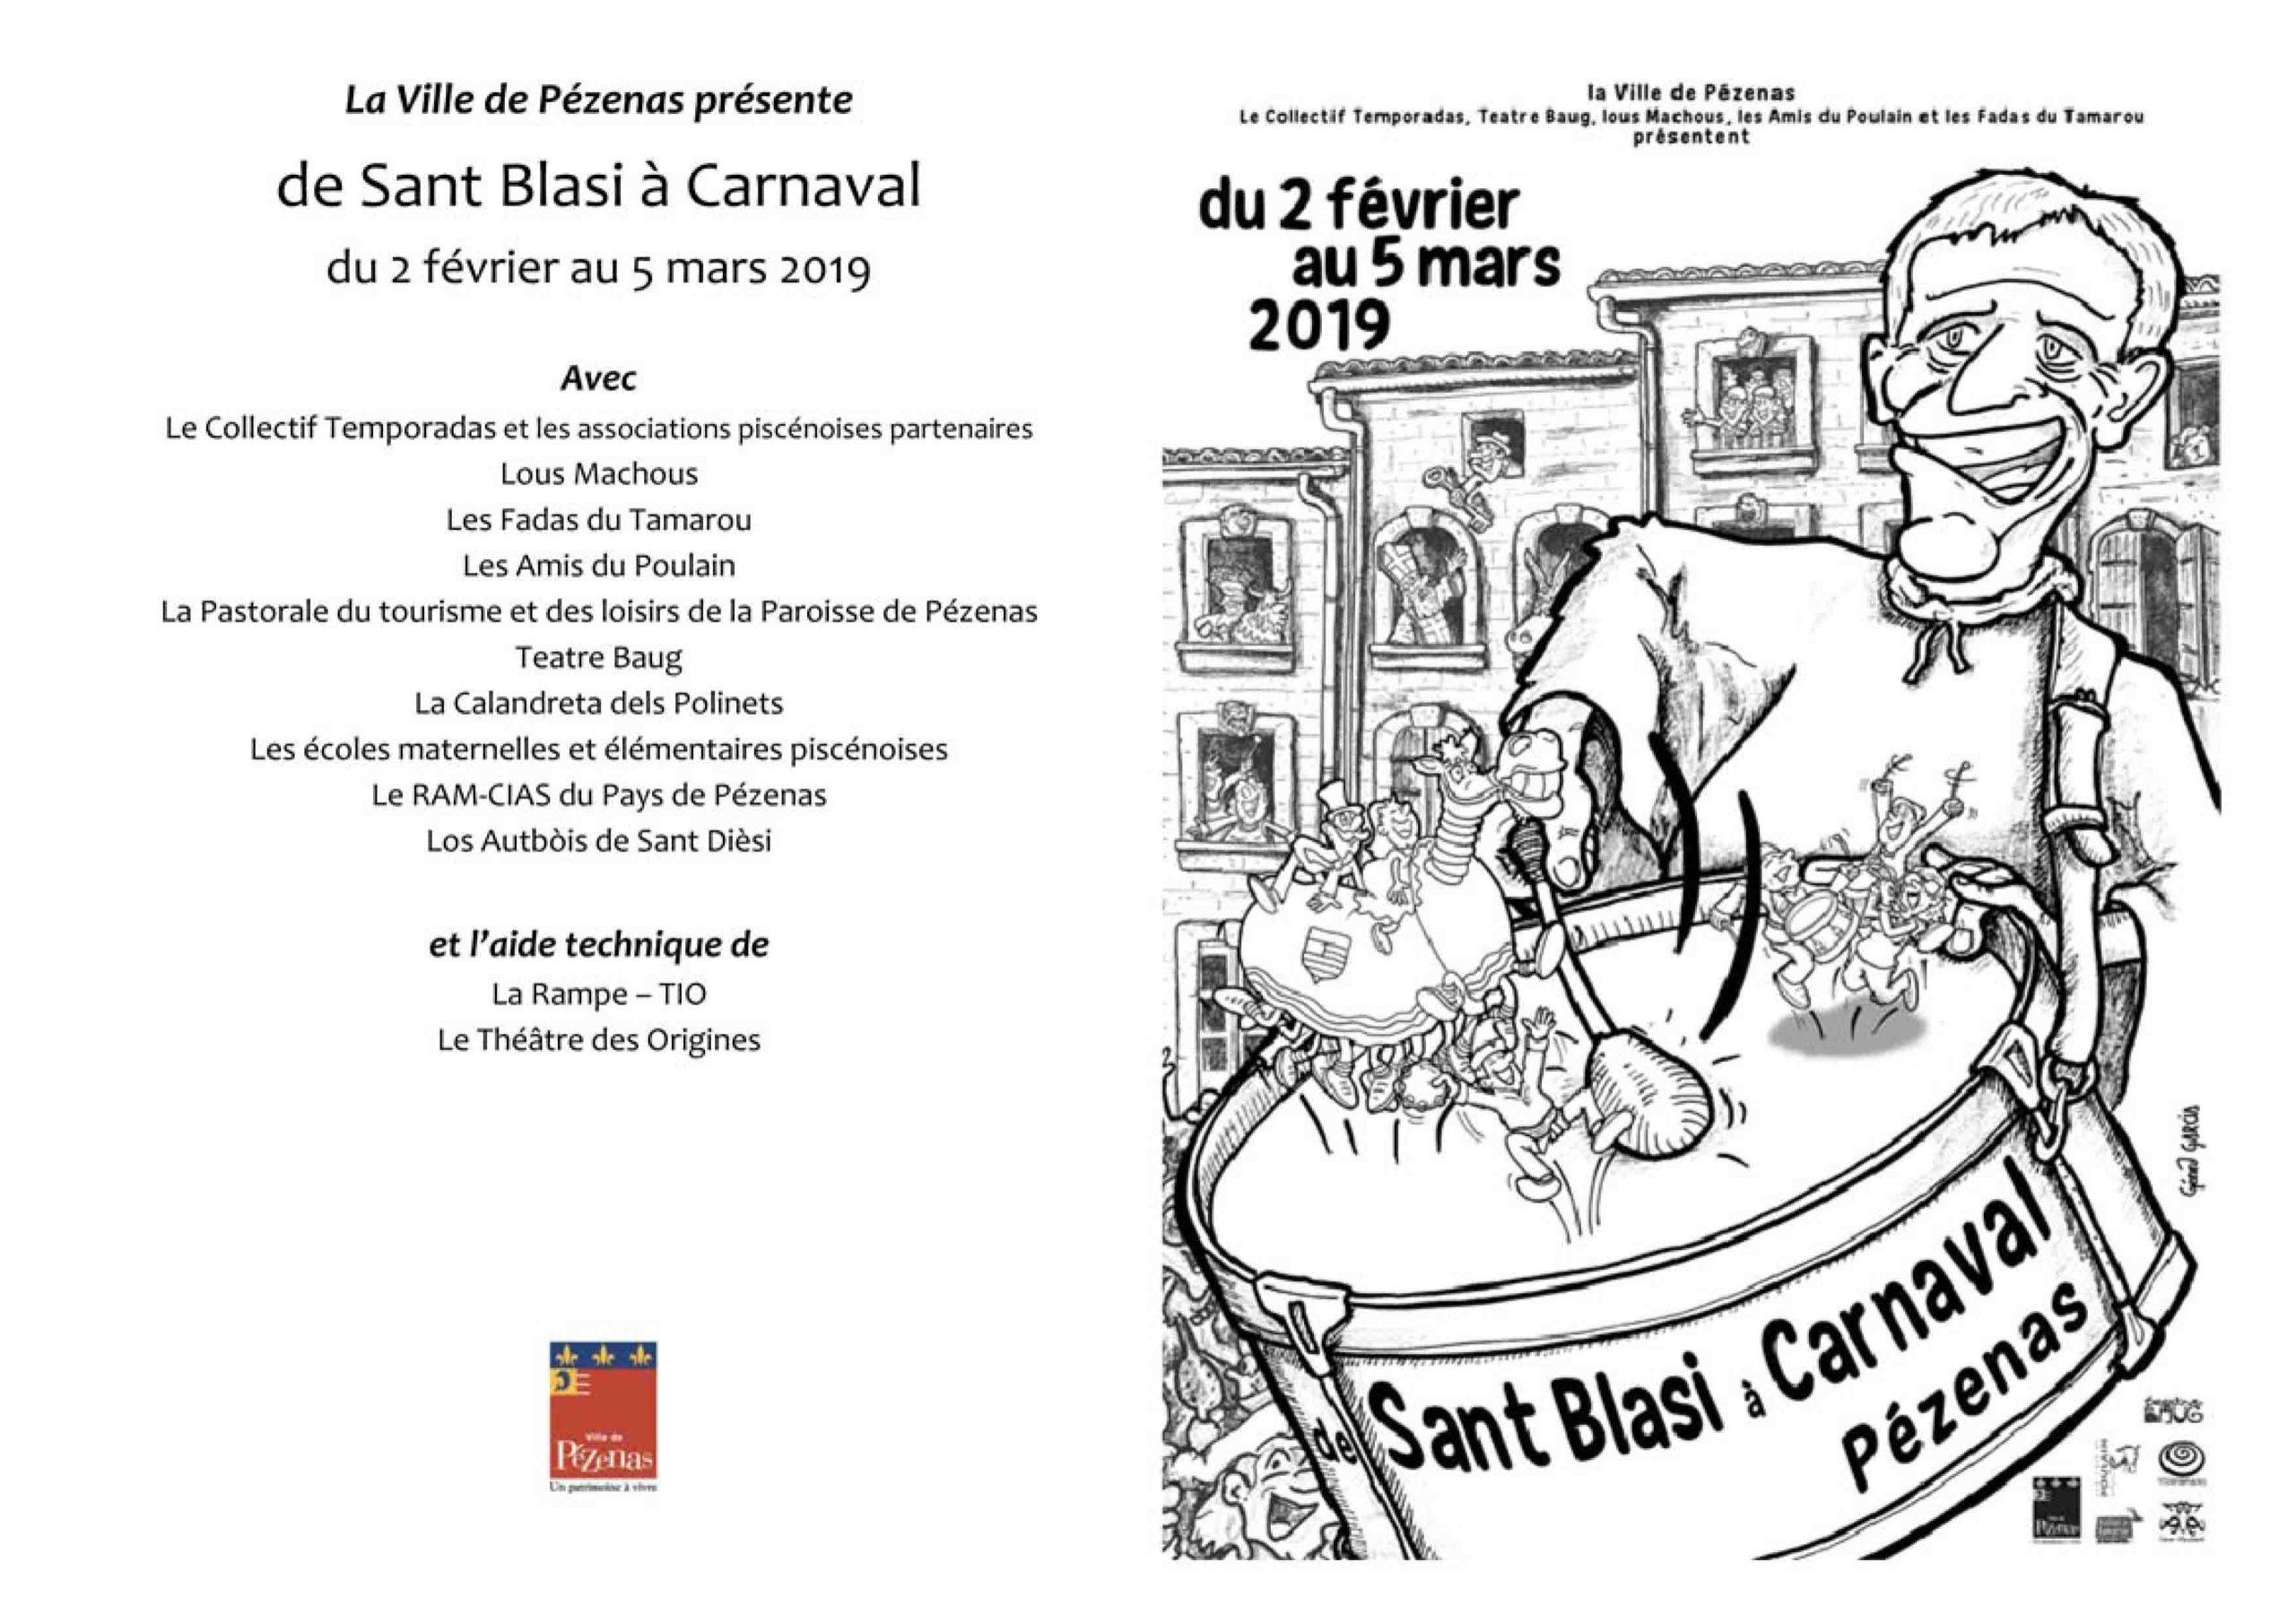 Programme_SantBlasi-Caranaval-19-1